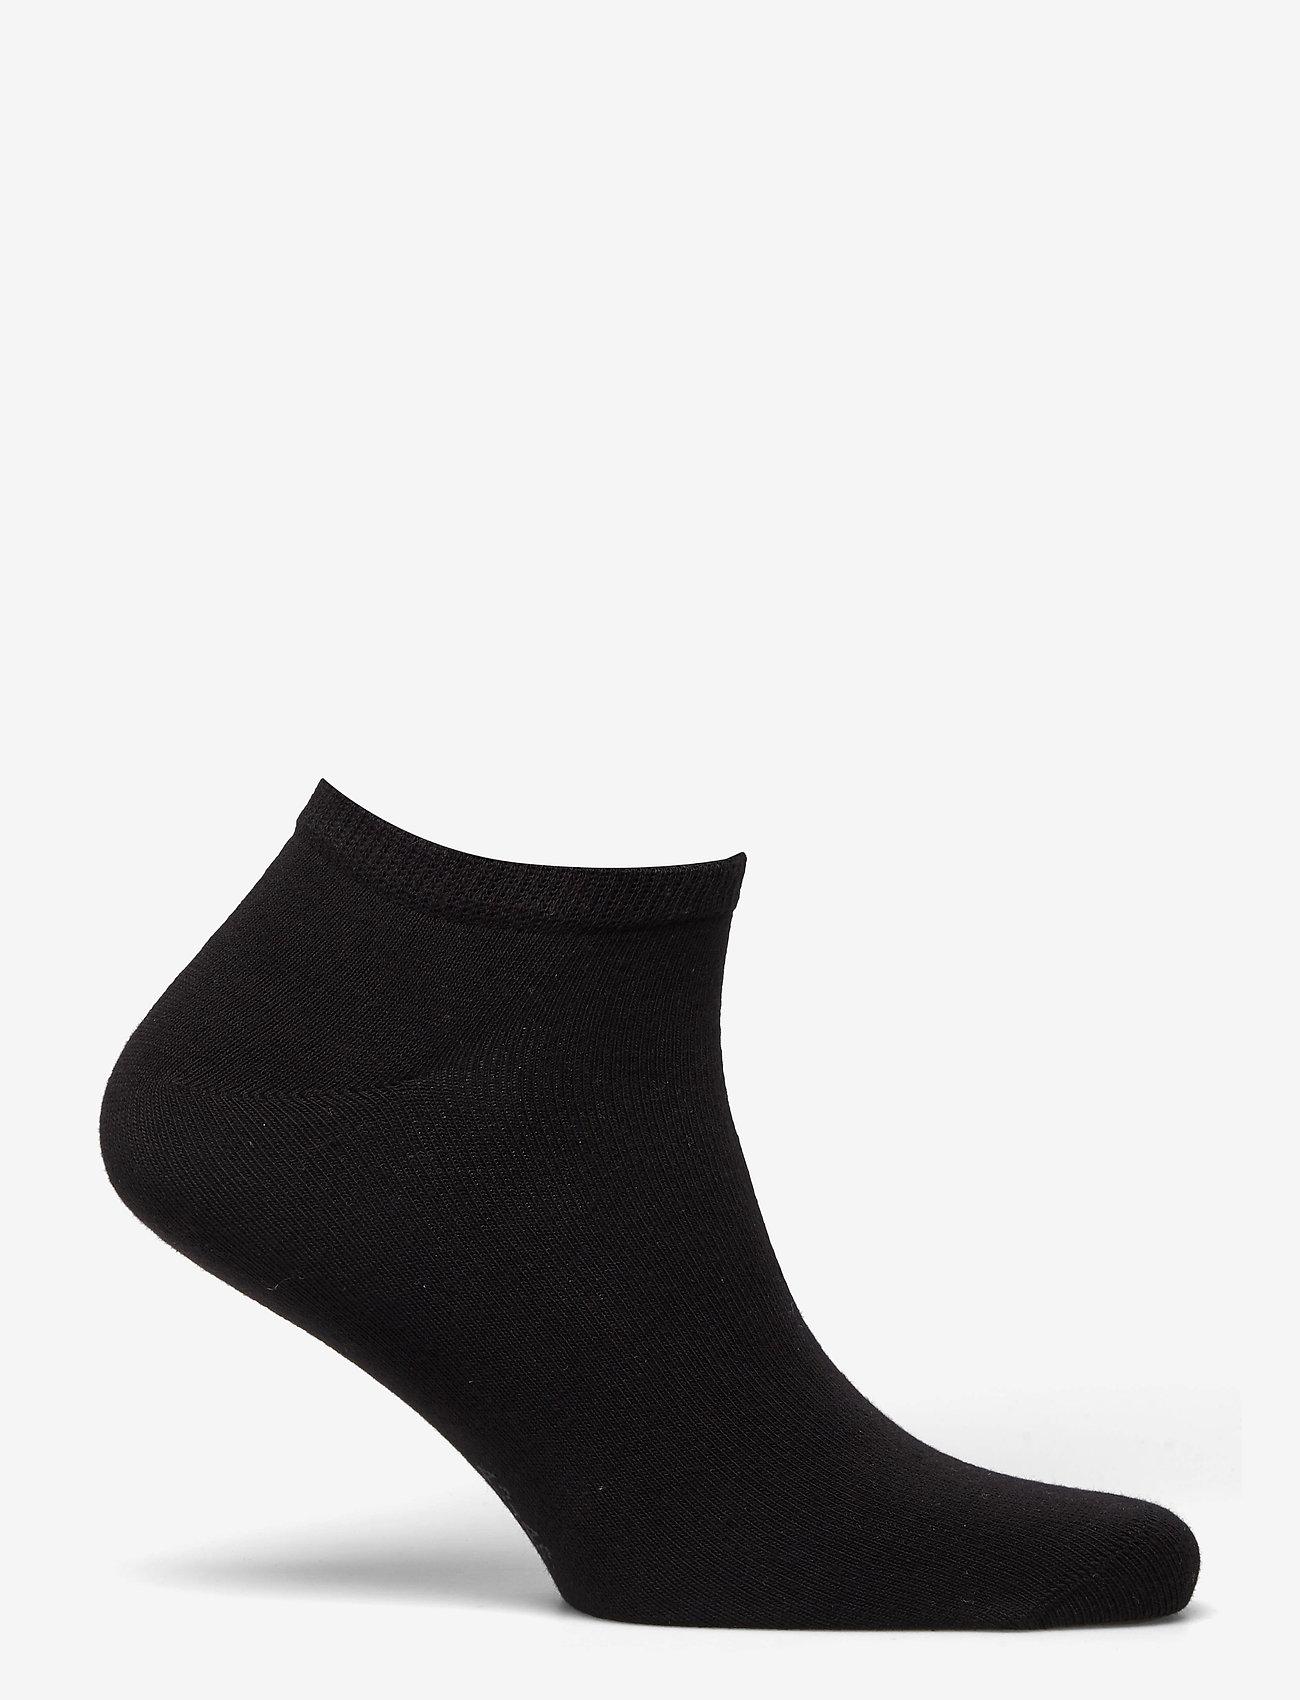 Björn Borg - SOCK STEP SOLID ESSENTIAL - ankle socks - black - 1